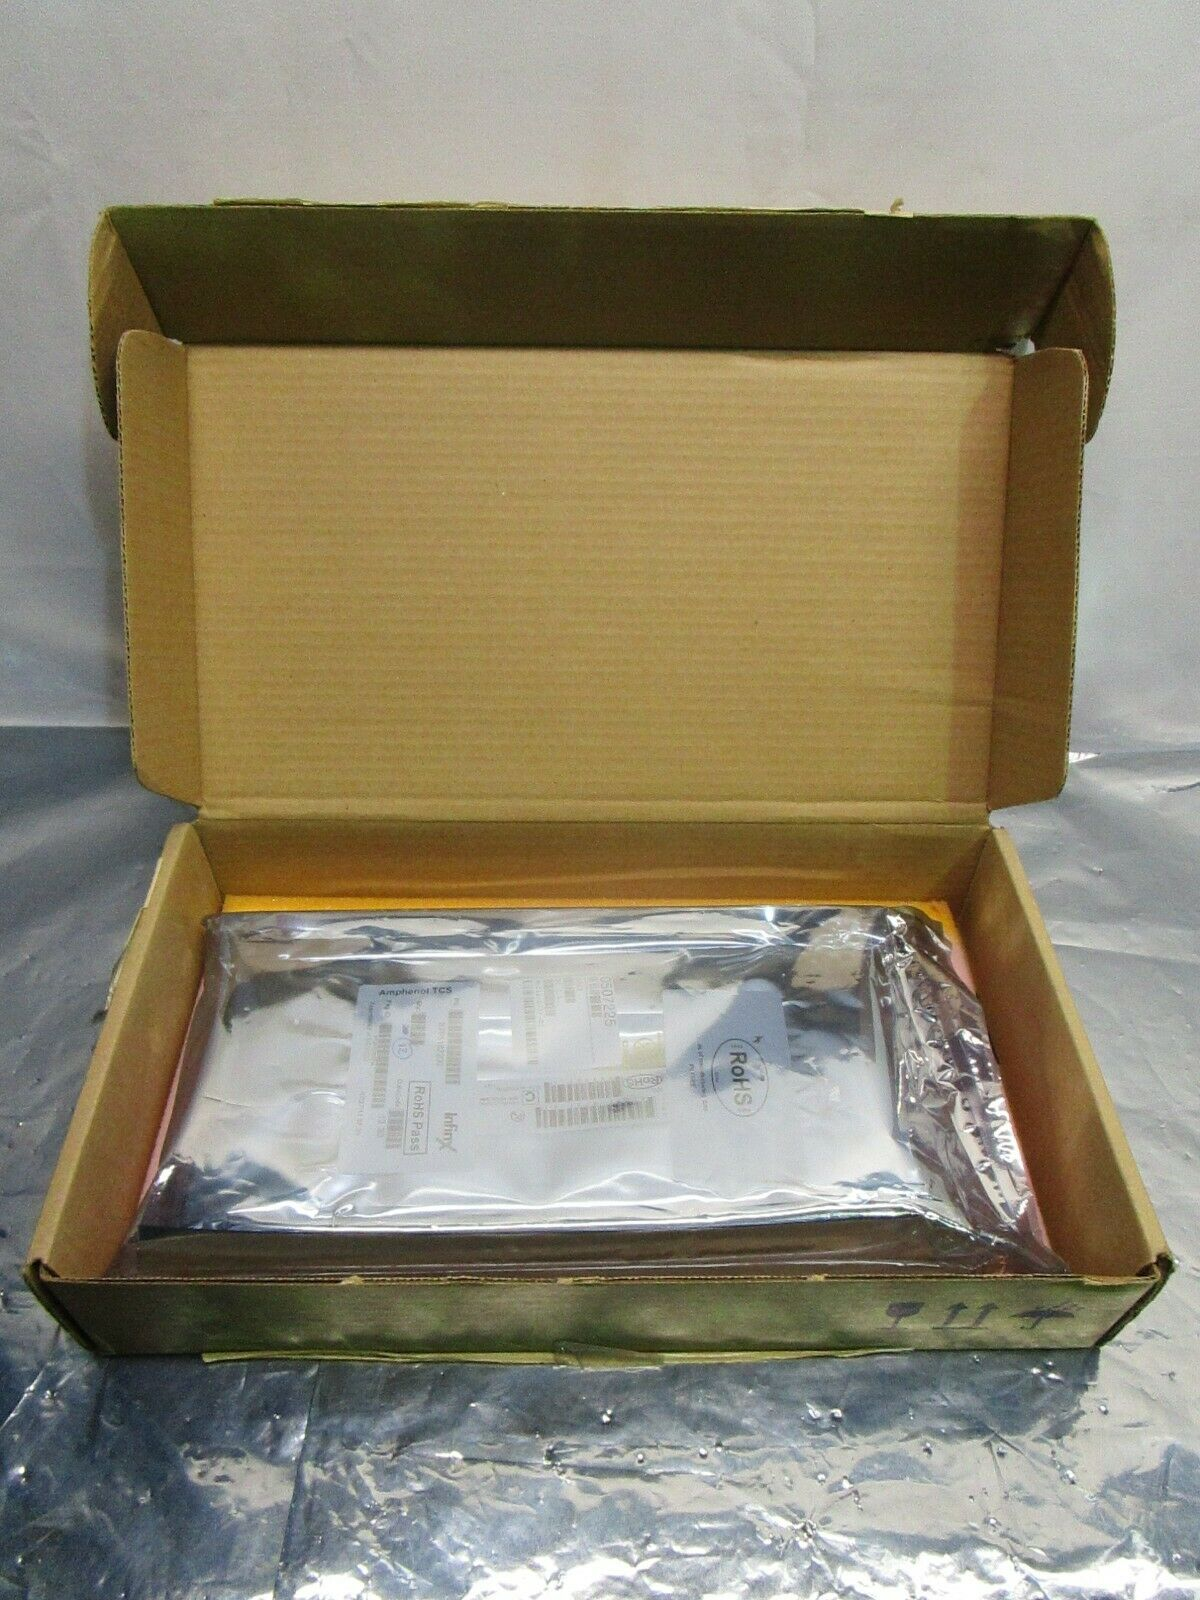 1 Lot of 12 Amphenol TCS 3795182200 PLUG,INFINX,6PR 18POS 3MM, 100MΩ, 102714